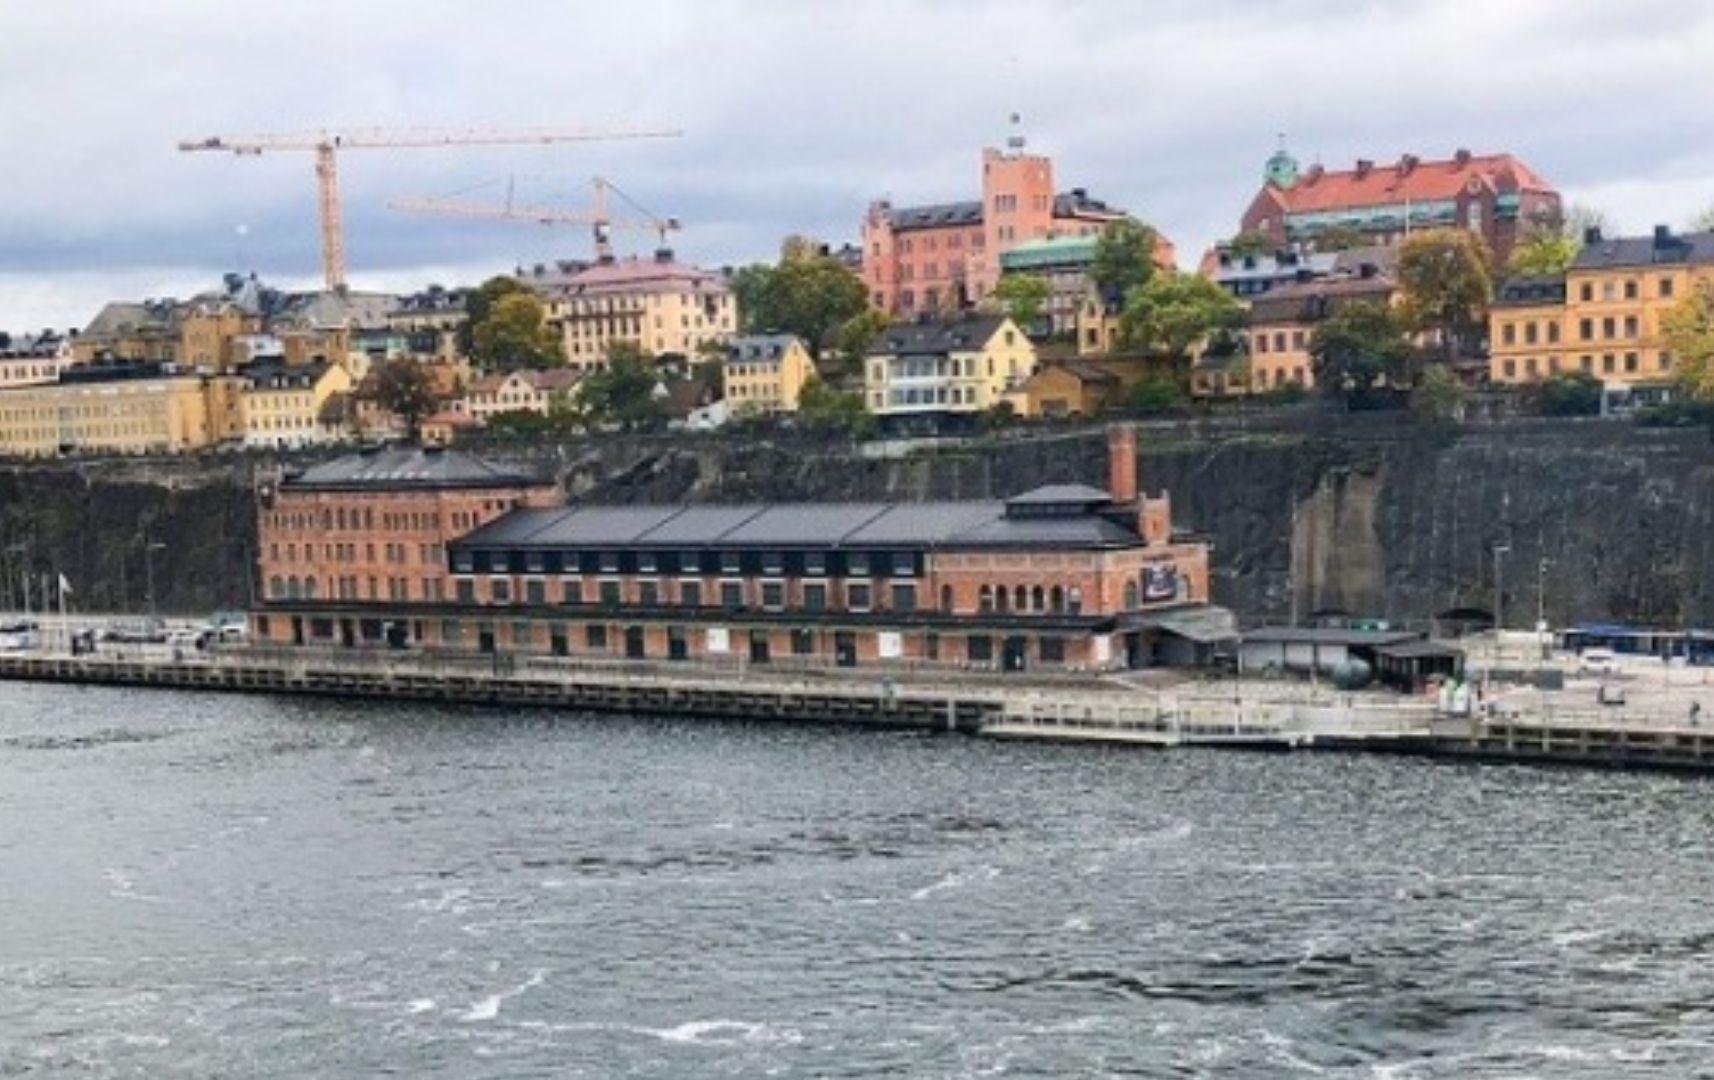 Hafen Reisebericht AIDA Reiseart